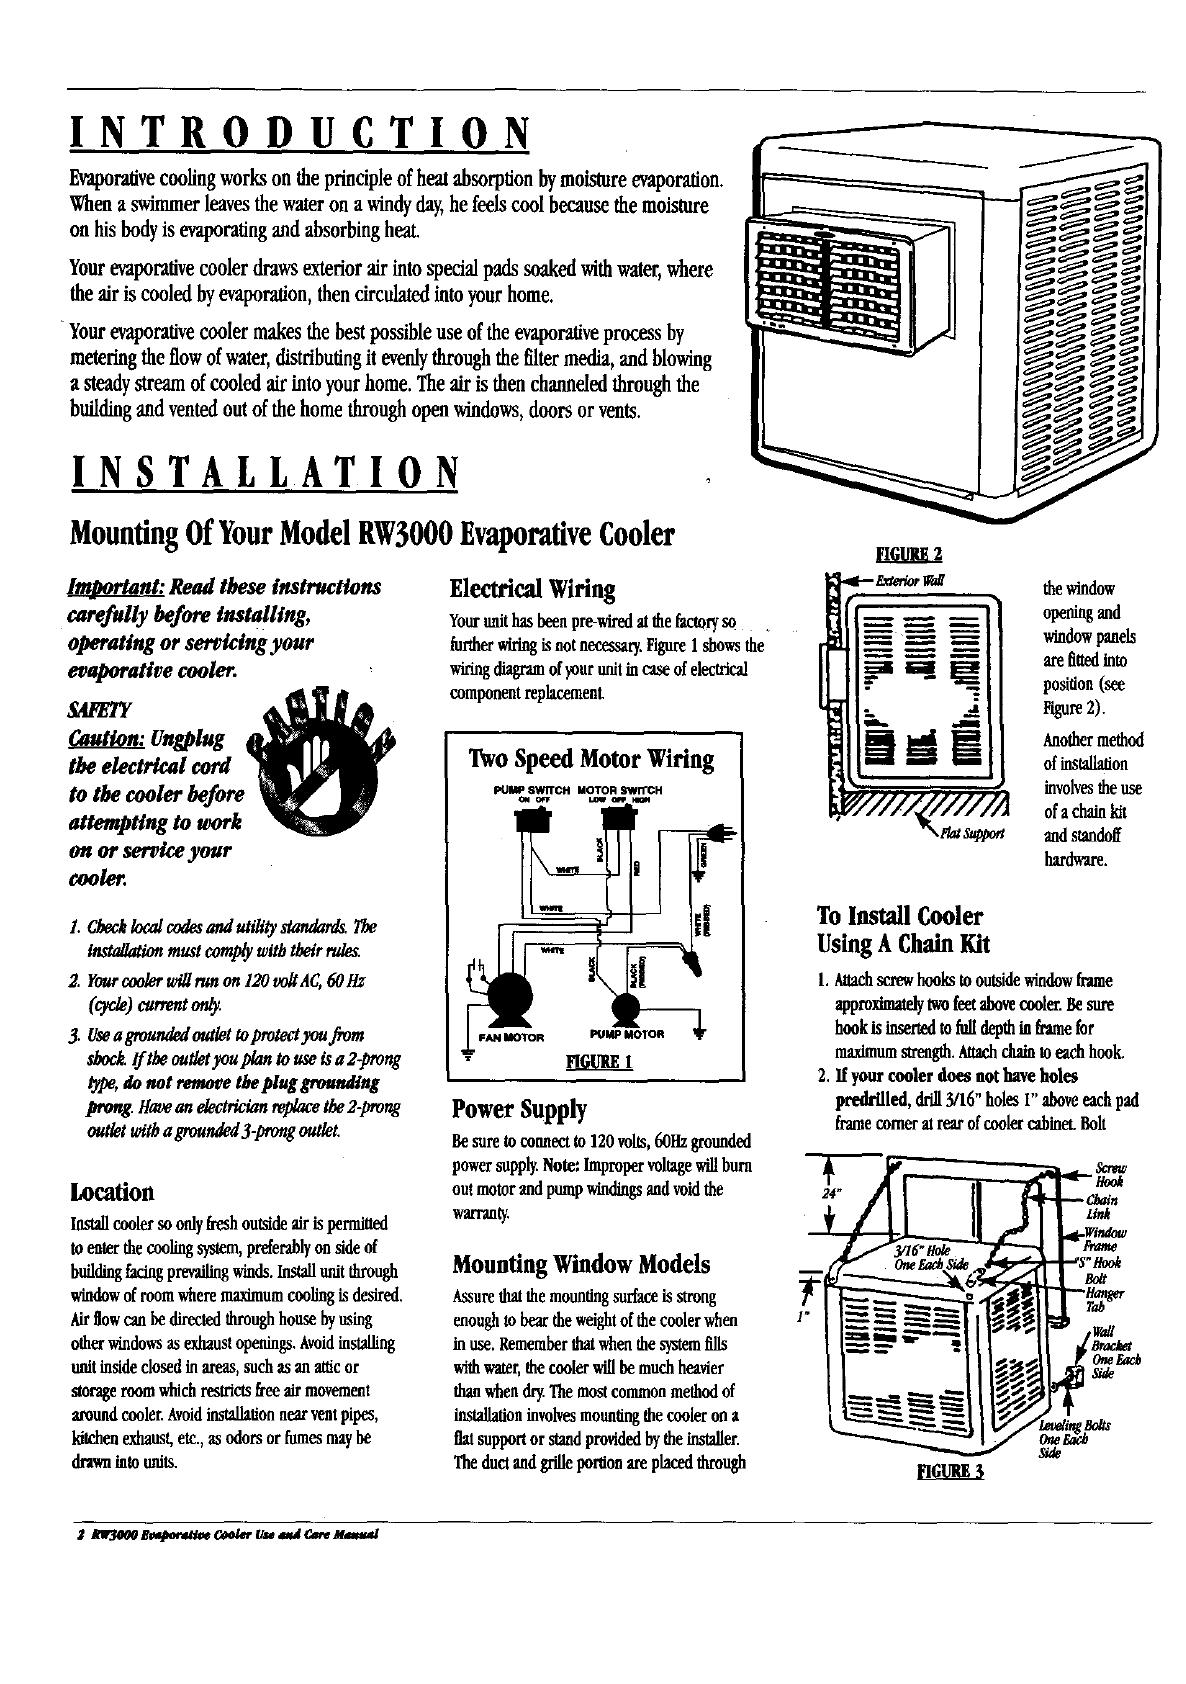 Adobeair Evaporative Cooler Manual L9070131 No Pump Swamp Motor Wiring Diagram Introduction